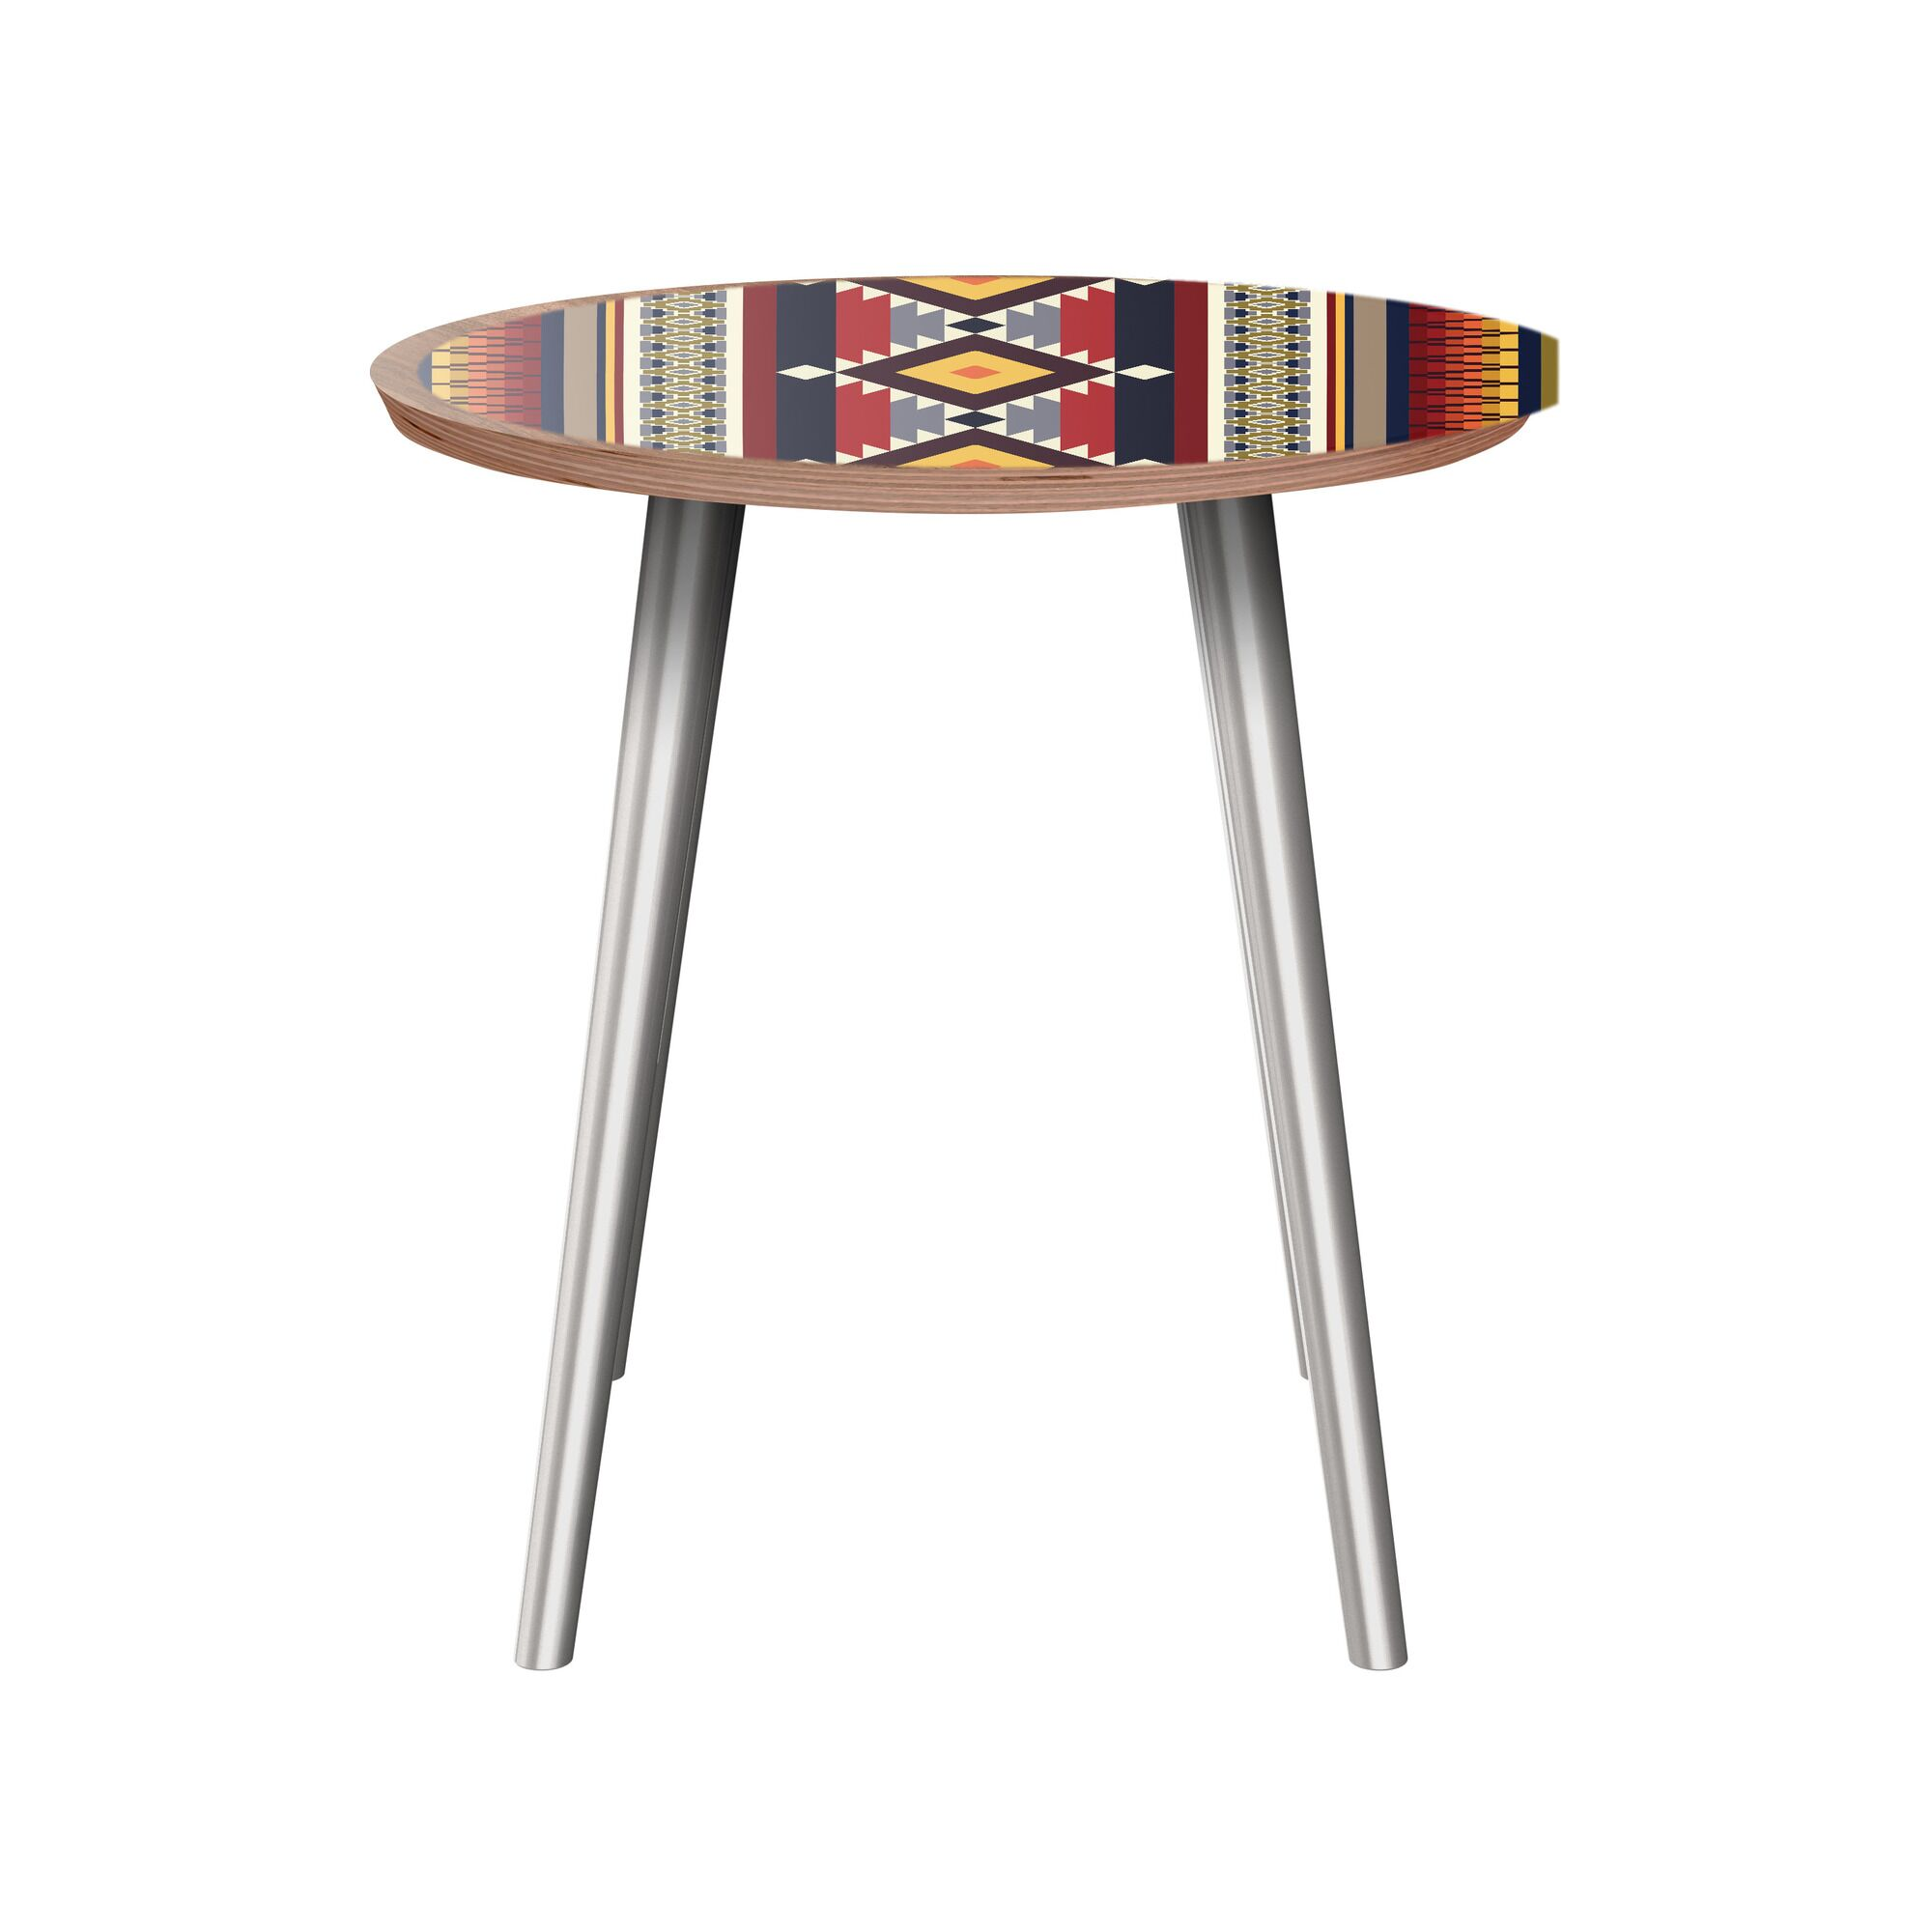 Kristan End Table Table Base Color: Chrome, Table Top Color: Walnut